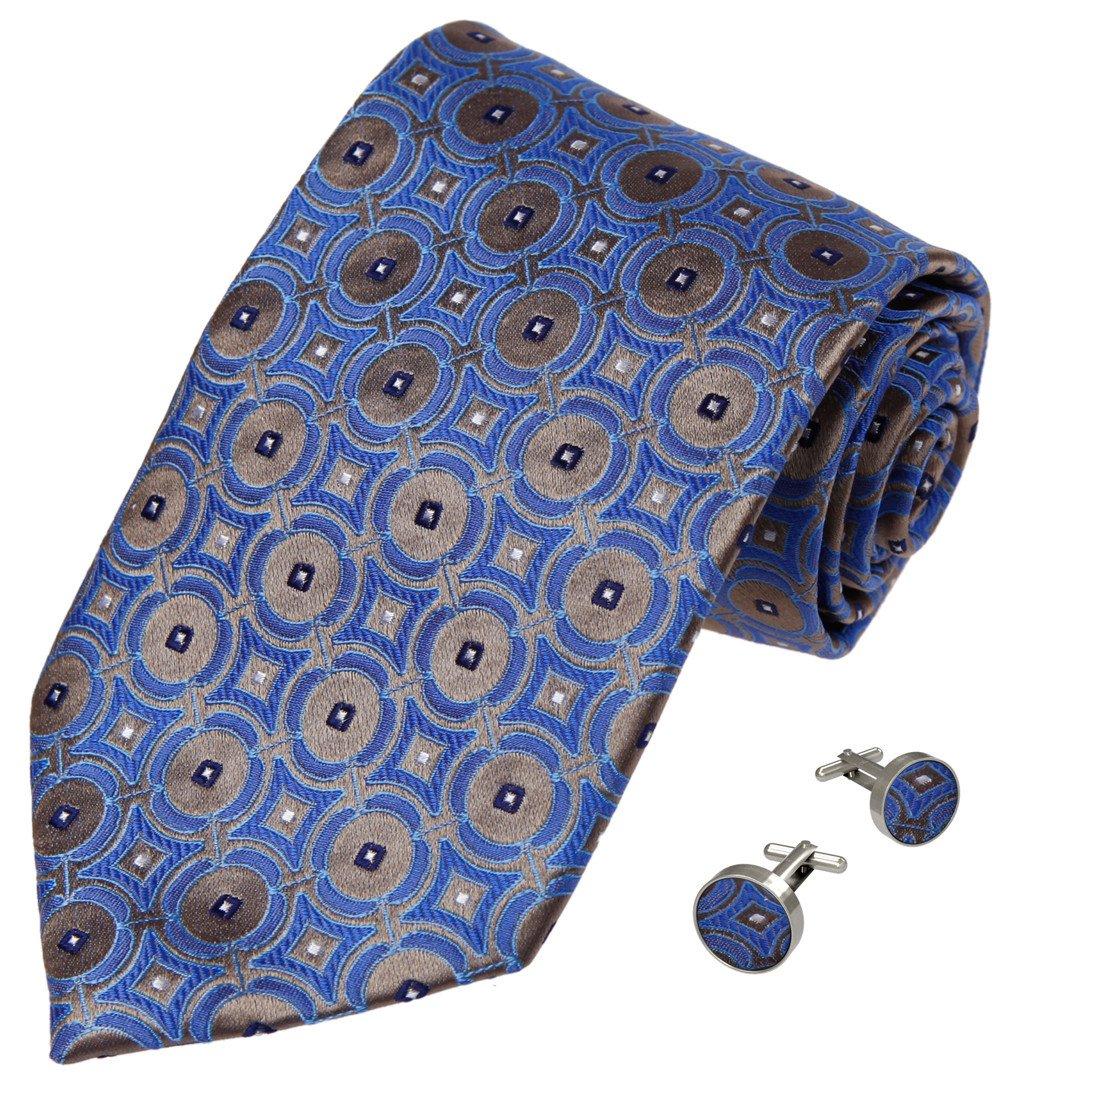 Y/&G Mens Fashion Various of Colors Polka Dots Necktie Birthday Gifts Silk Tie Cufflinks 2PT